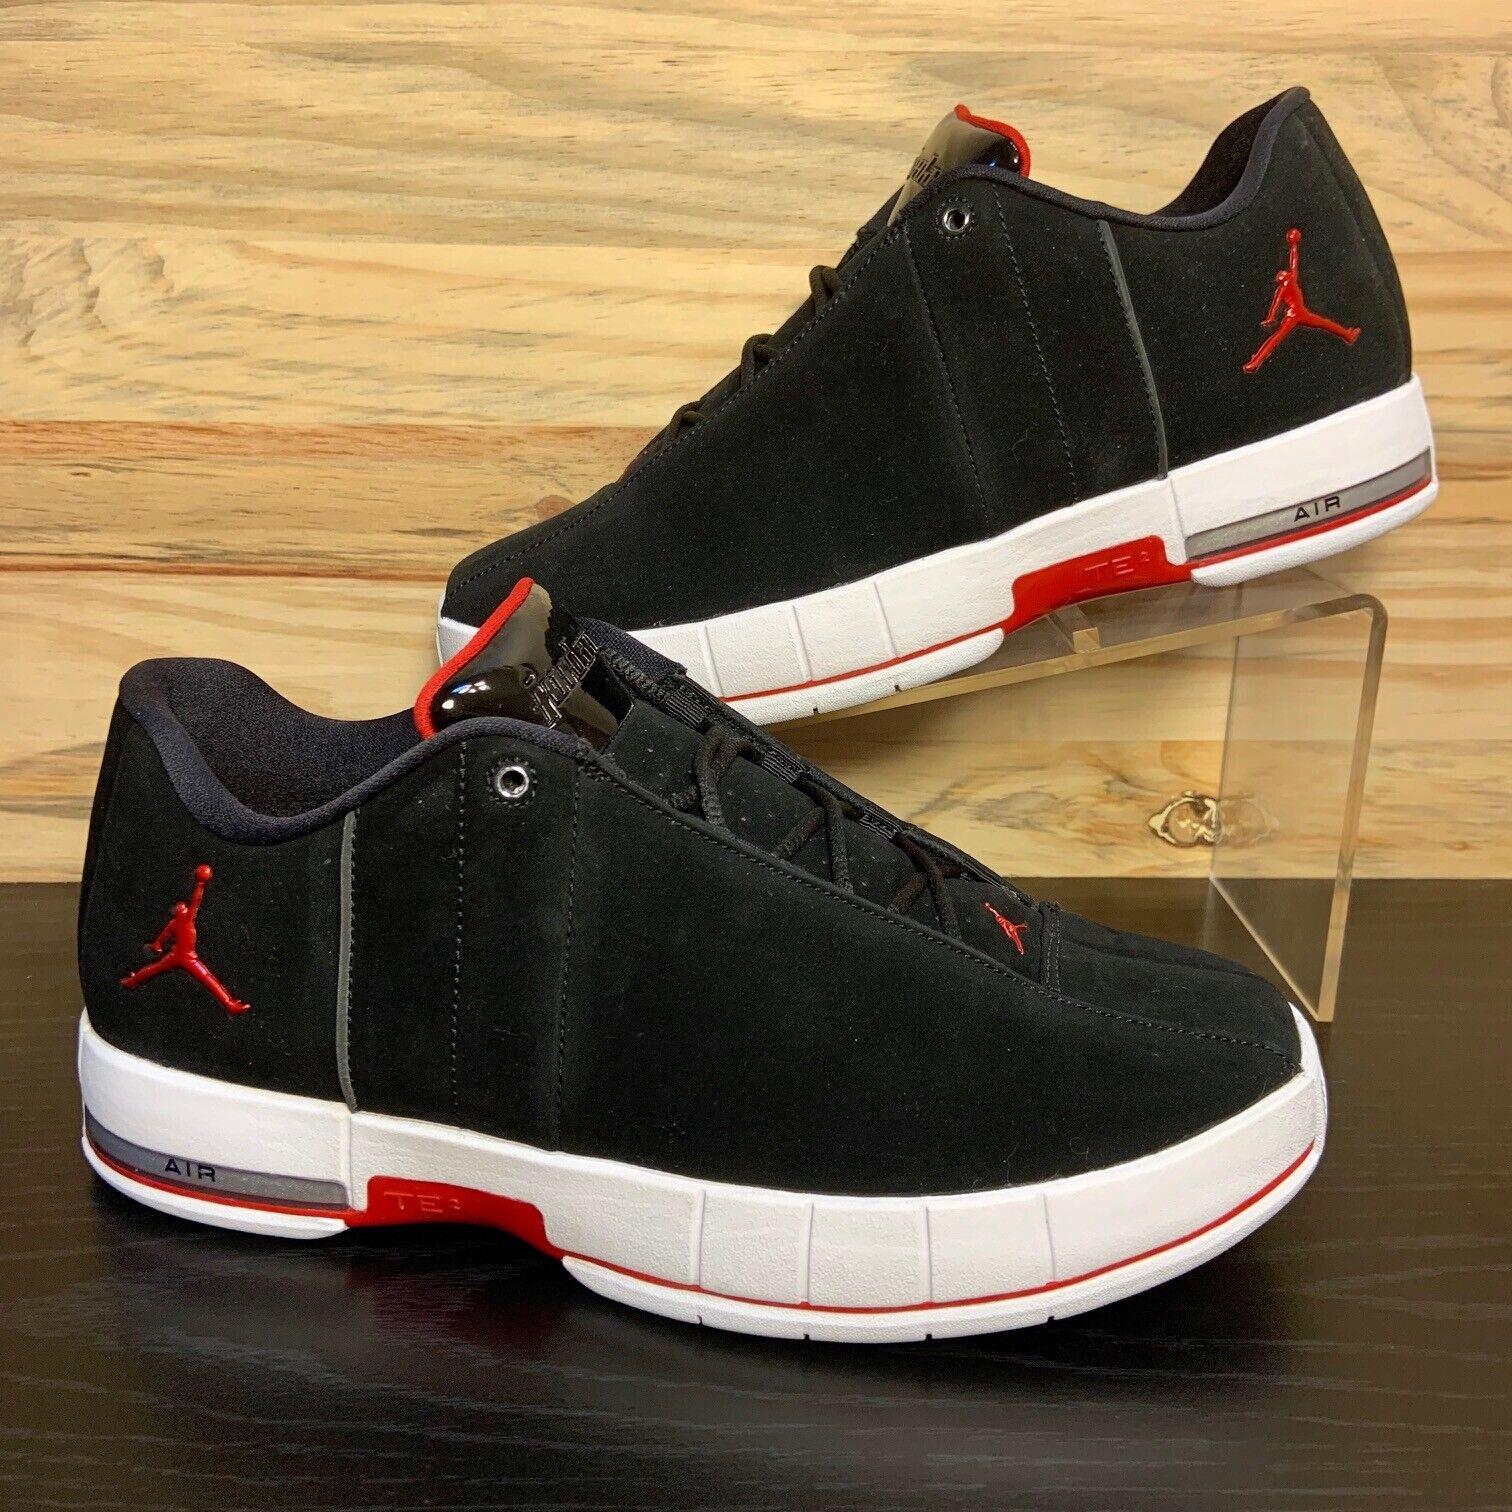 meilleures baskets 0c9b1 b5866 Nike Air Jordan Team Elite 2 Low Men's Suede Shoes Black Red Size 9.5  AO1696-001